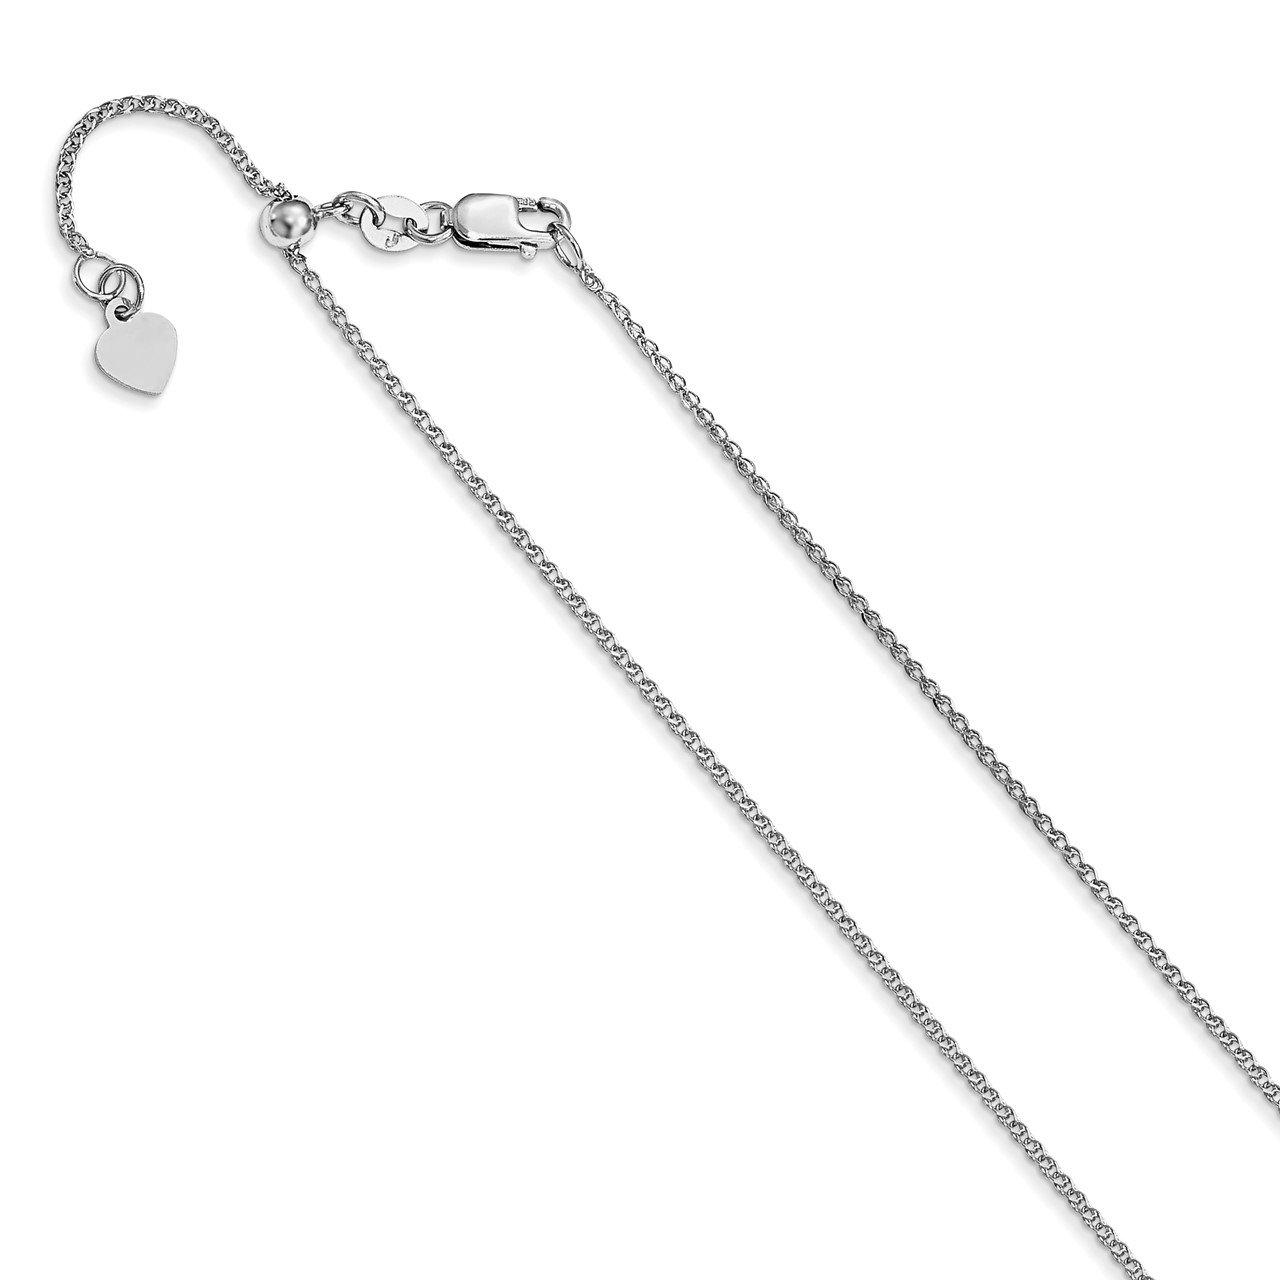 Leslie's 14K White Gold Adjustable 1.2 mm D/C Loose Rope Chain